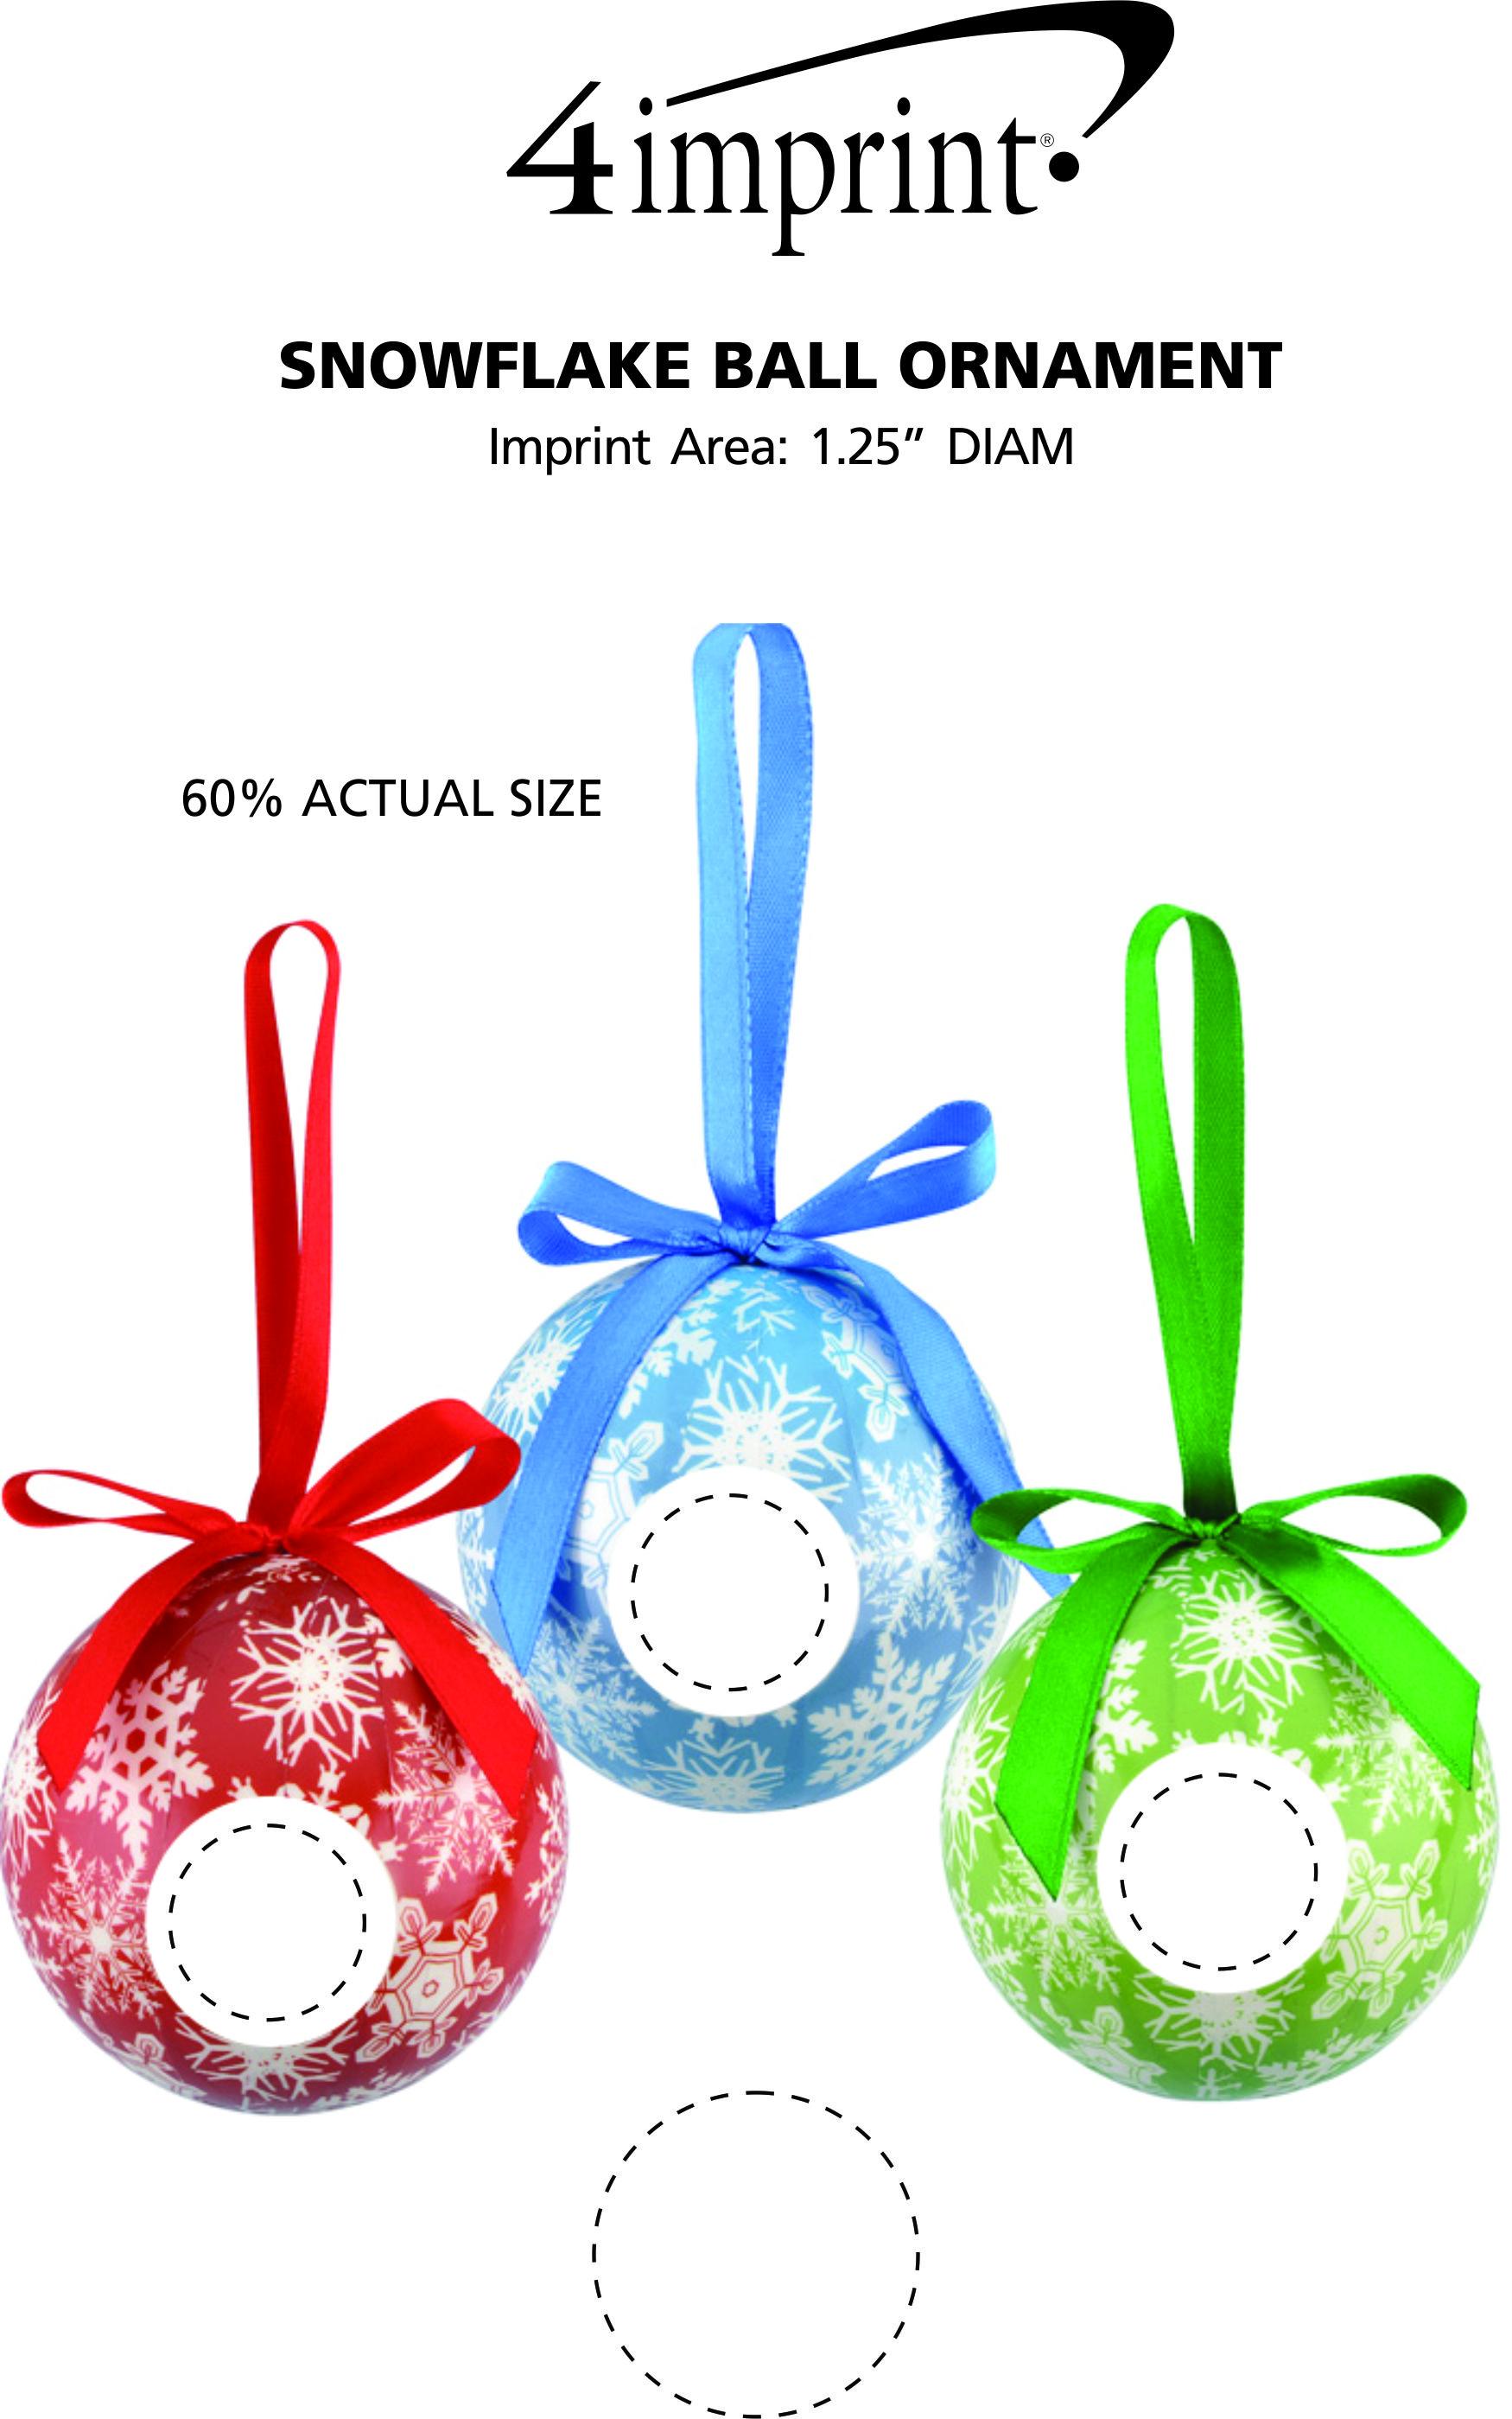 Imprint Area of Snowflake Ball Ornament